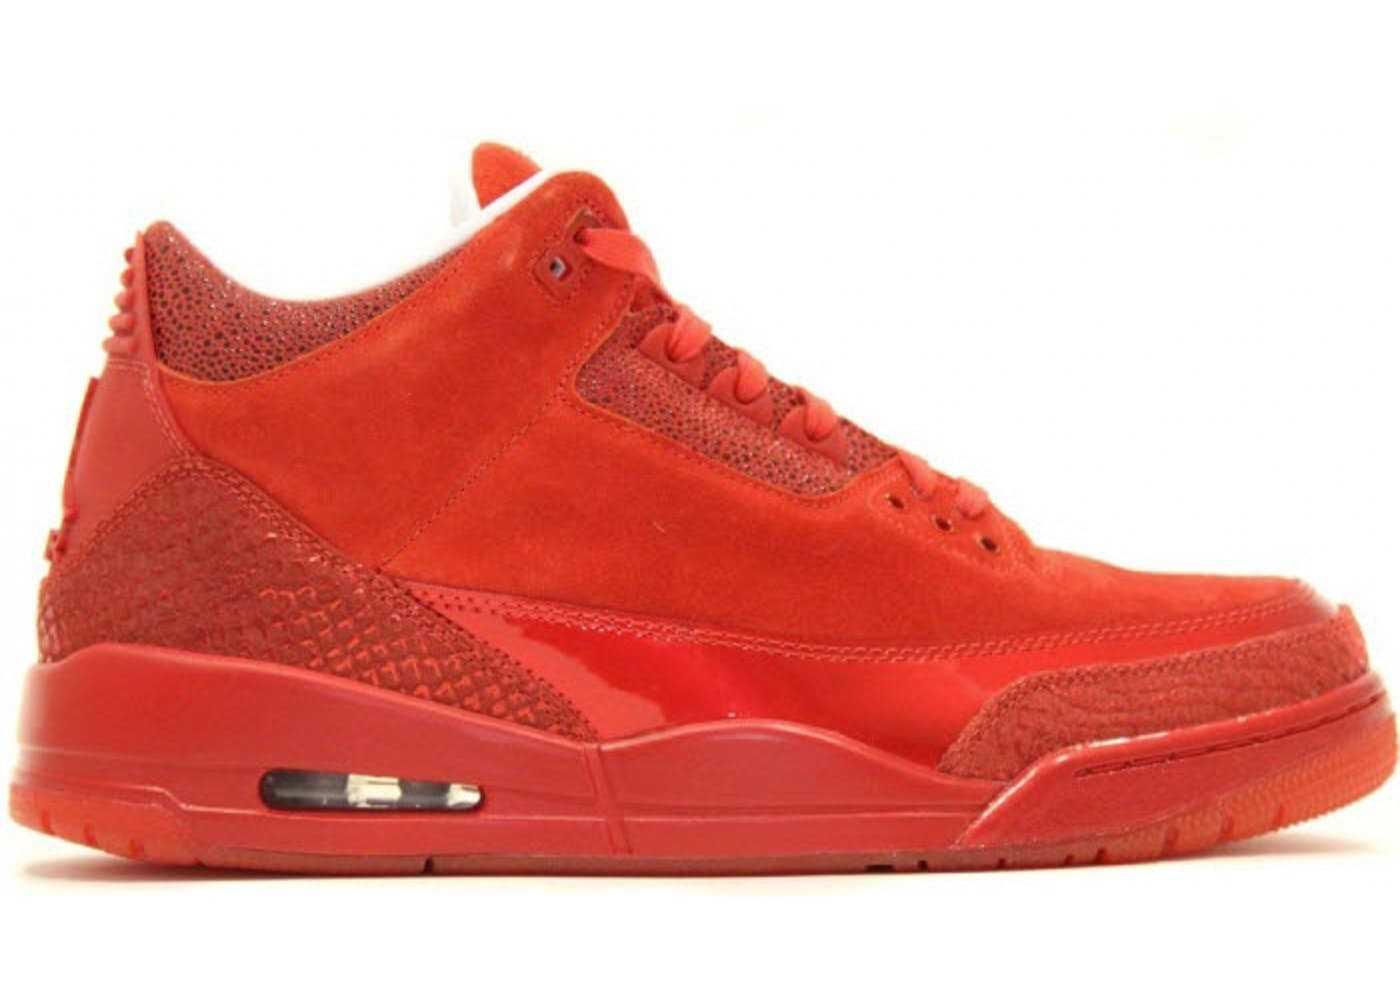 Air Jordan 3 Retro Legends Of Summer Sneaker Freaker